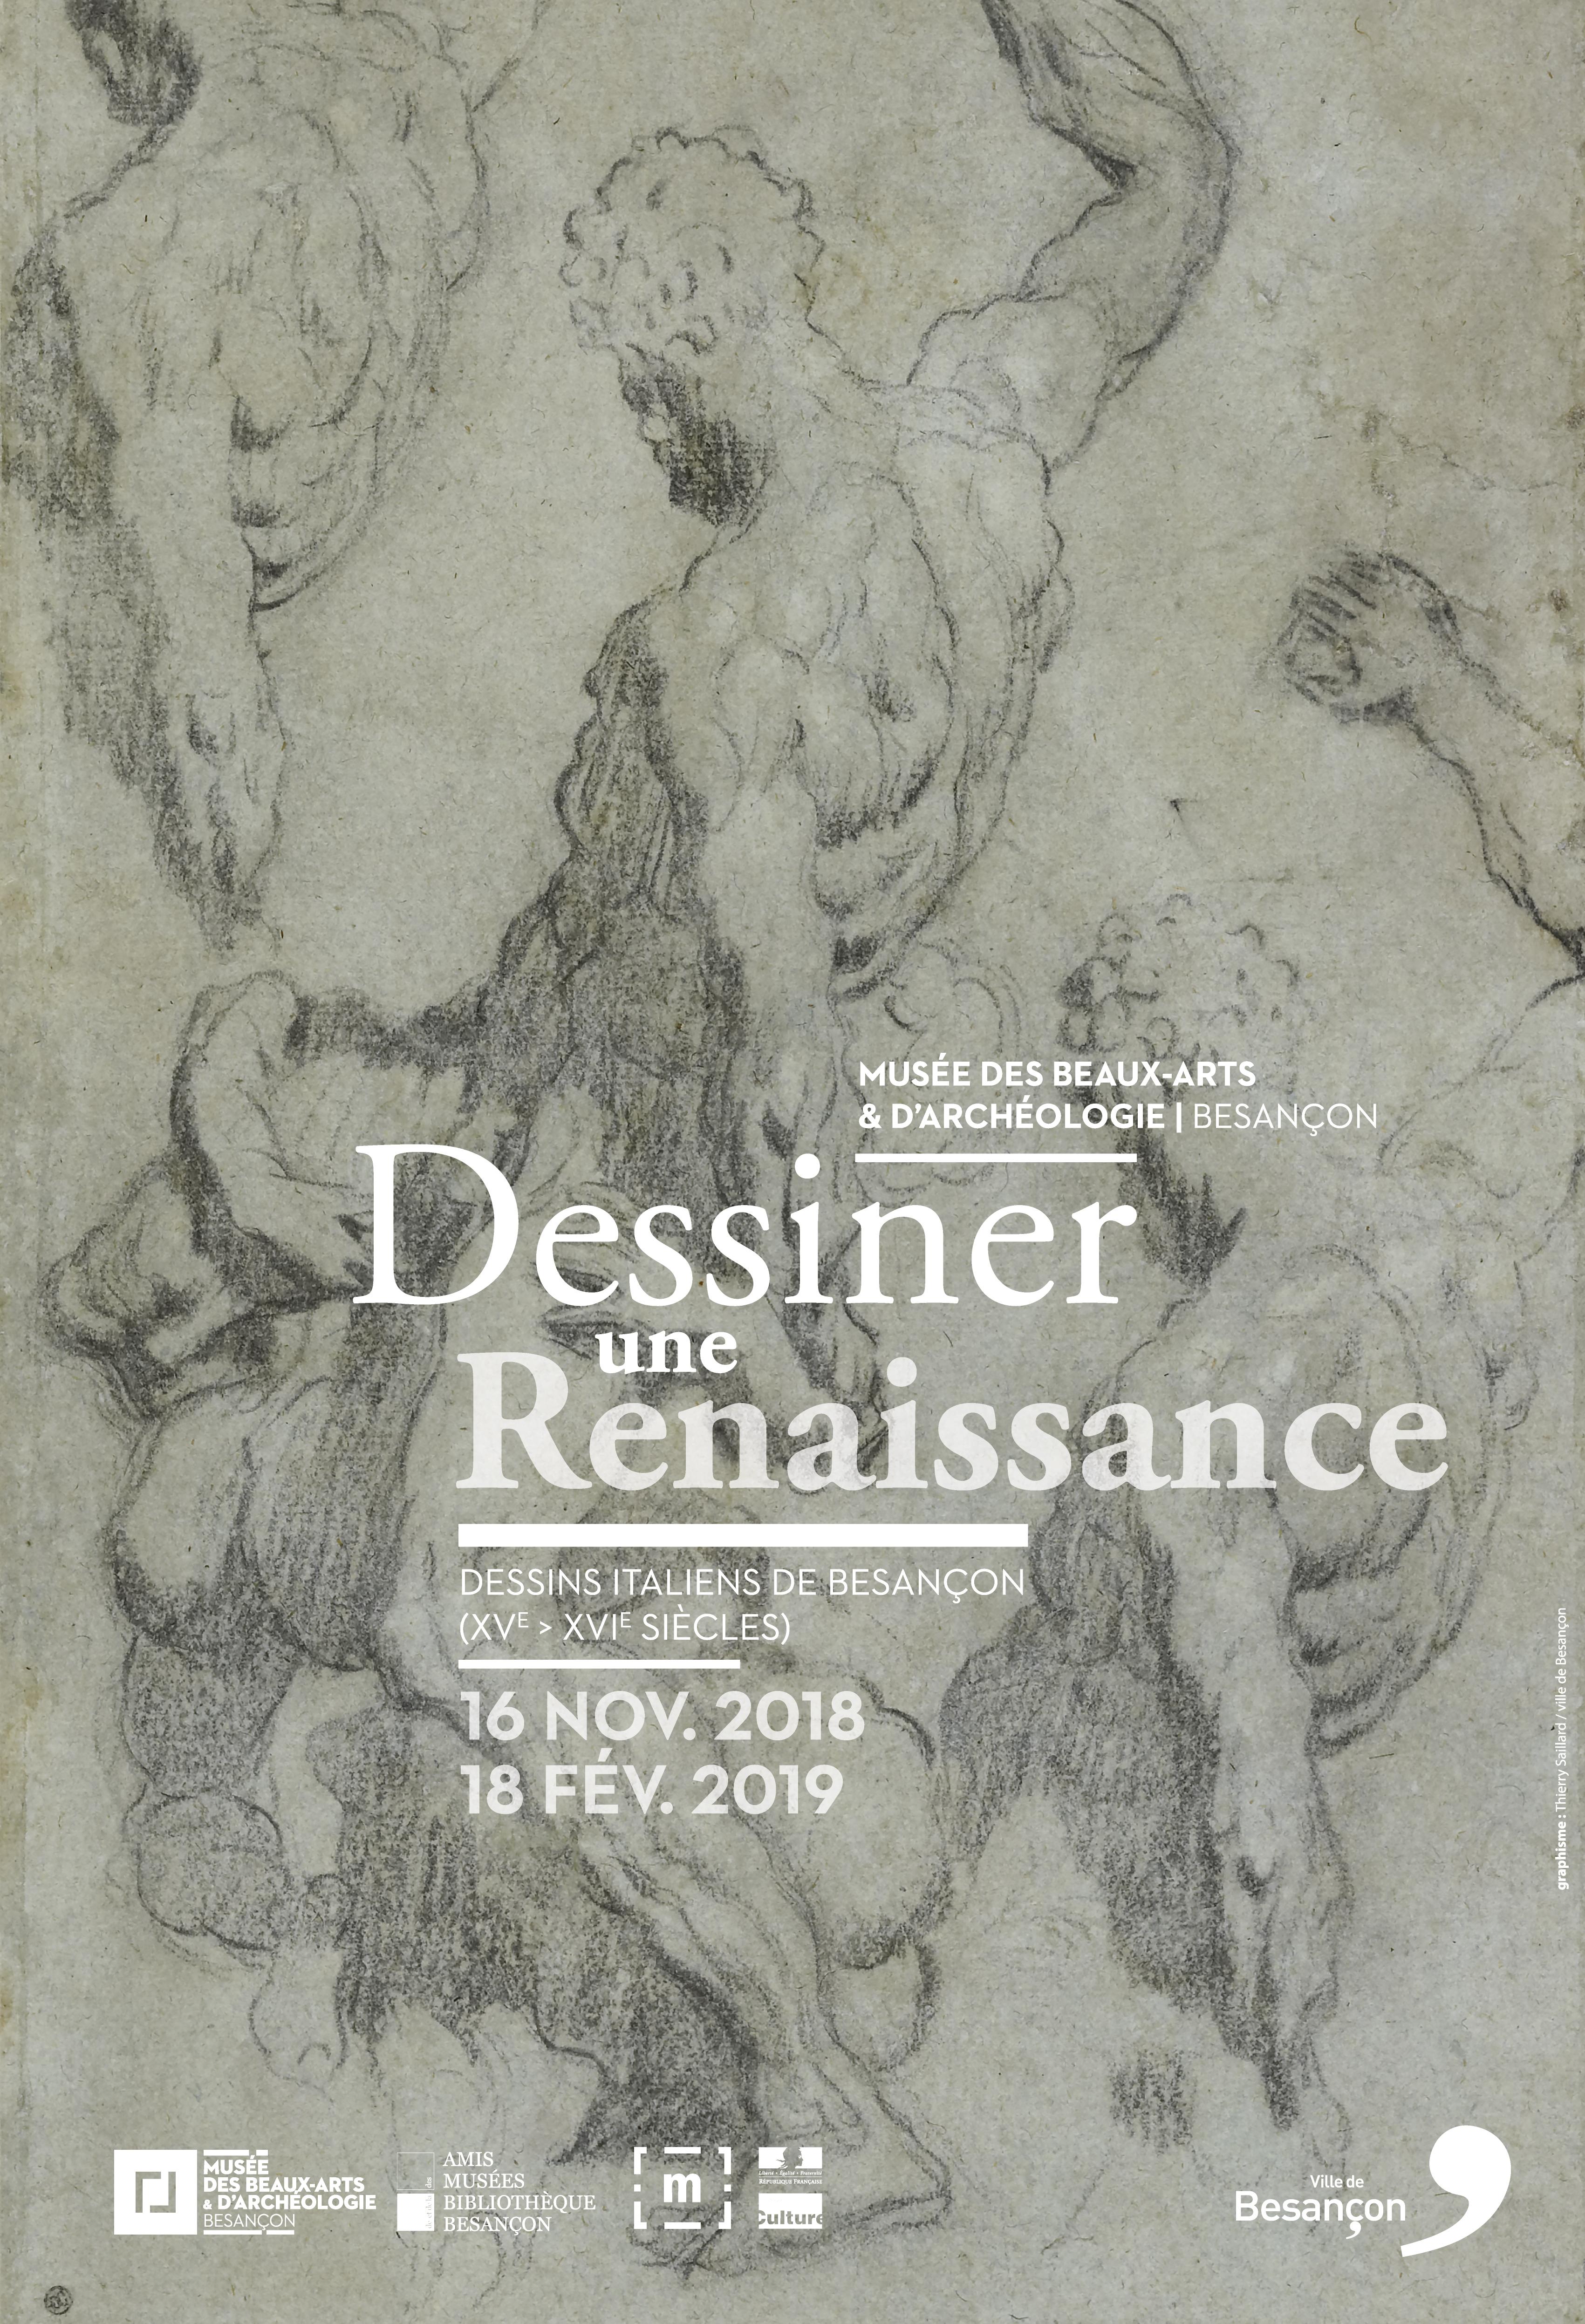 http://www.mbaa.besancon.fr/wp-content/uploads/2018/11/affiche-dessiner_une_renaissance.jpg